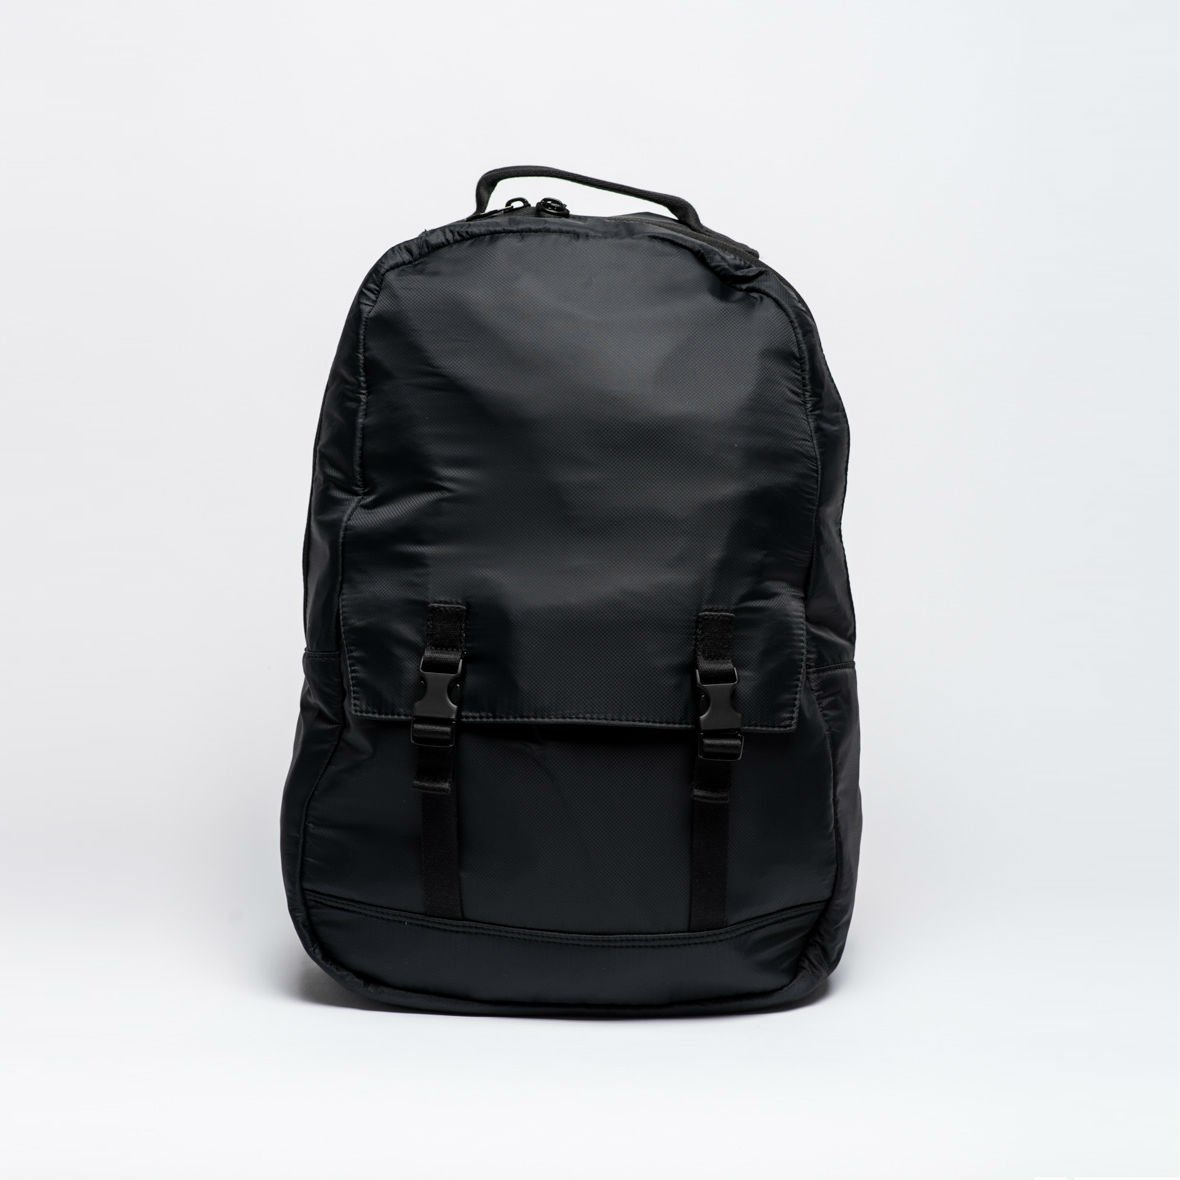 b0139f8a620 Batoh simple pocket backpack ripstop black levně